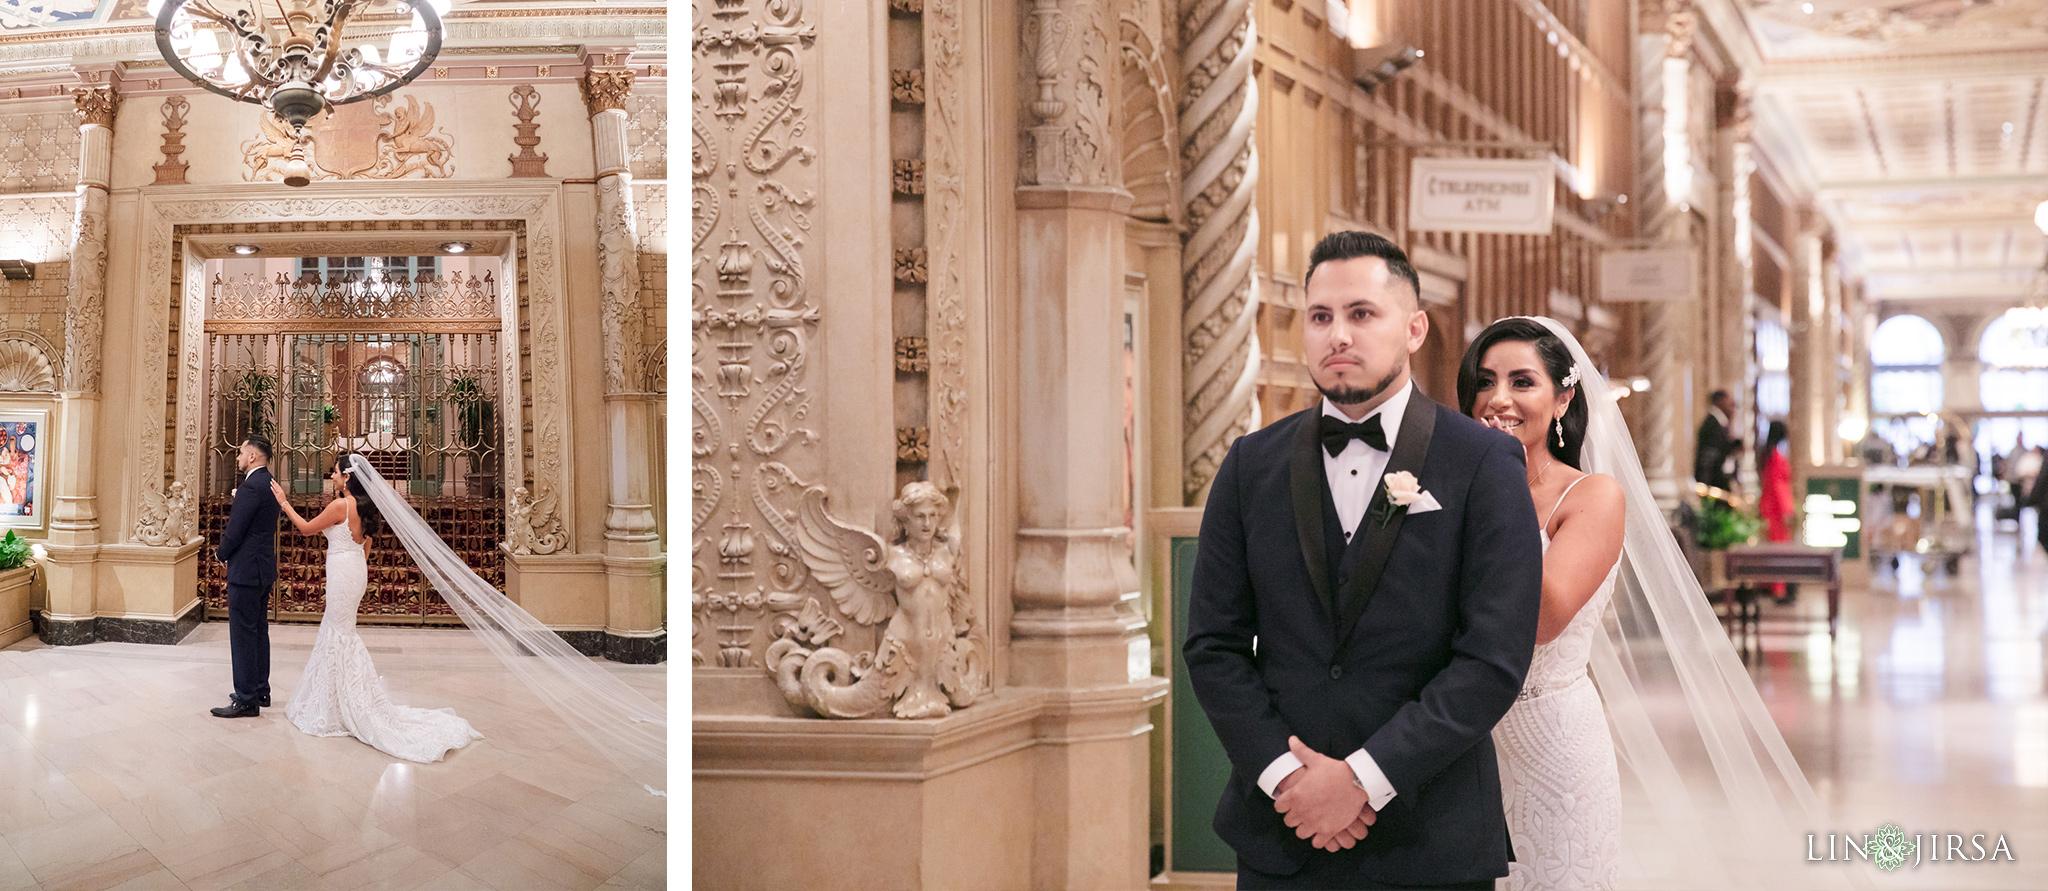 0028 Alexandria Ballroom Los Angeles County Wedding Photography